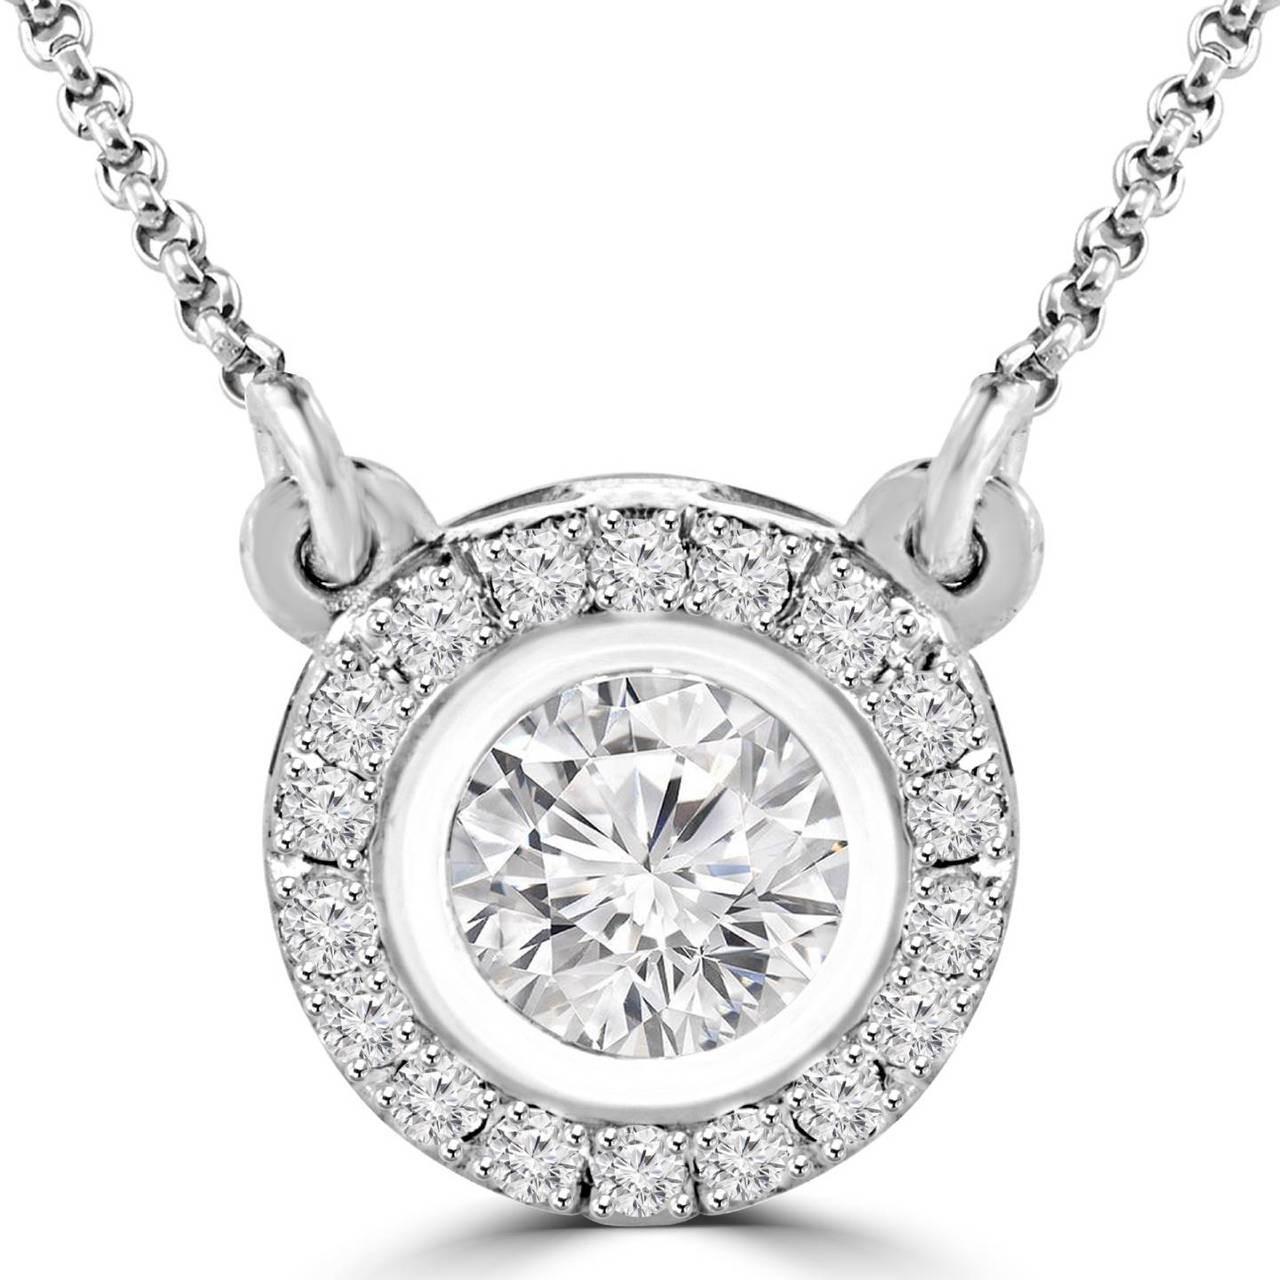 Bezel set diamond necklace bijoux majesty round diamond multi stone bezel set halo pendant necklace with round diamond accents chain in white gold lisa w aloadofball Choice Image